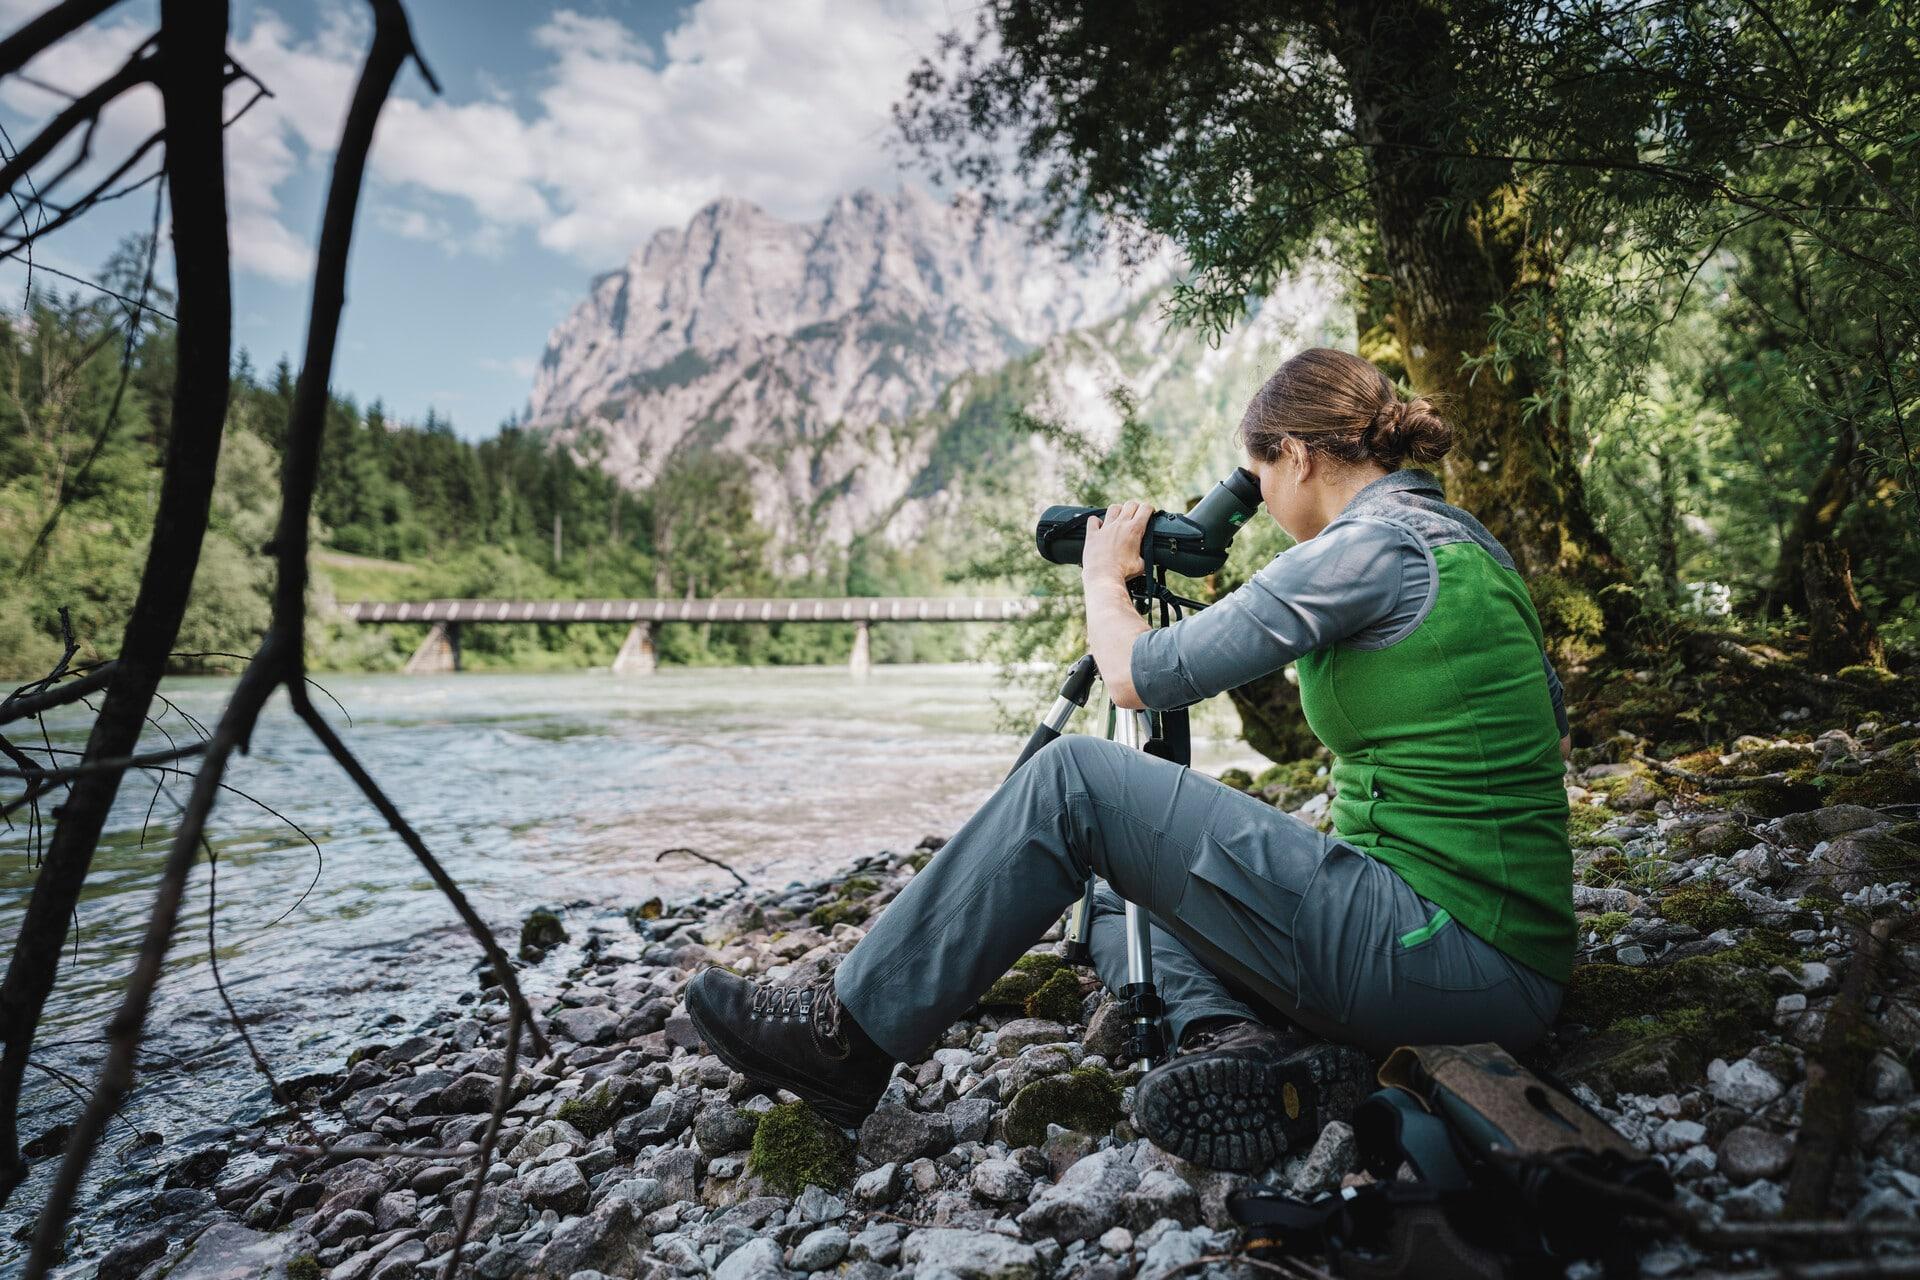 049_Nationalpark_Gesäuse_Naturschutz_Ranger©StefanLeitner_NPG